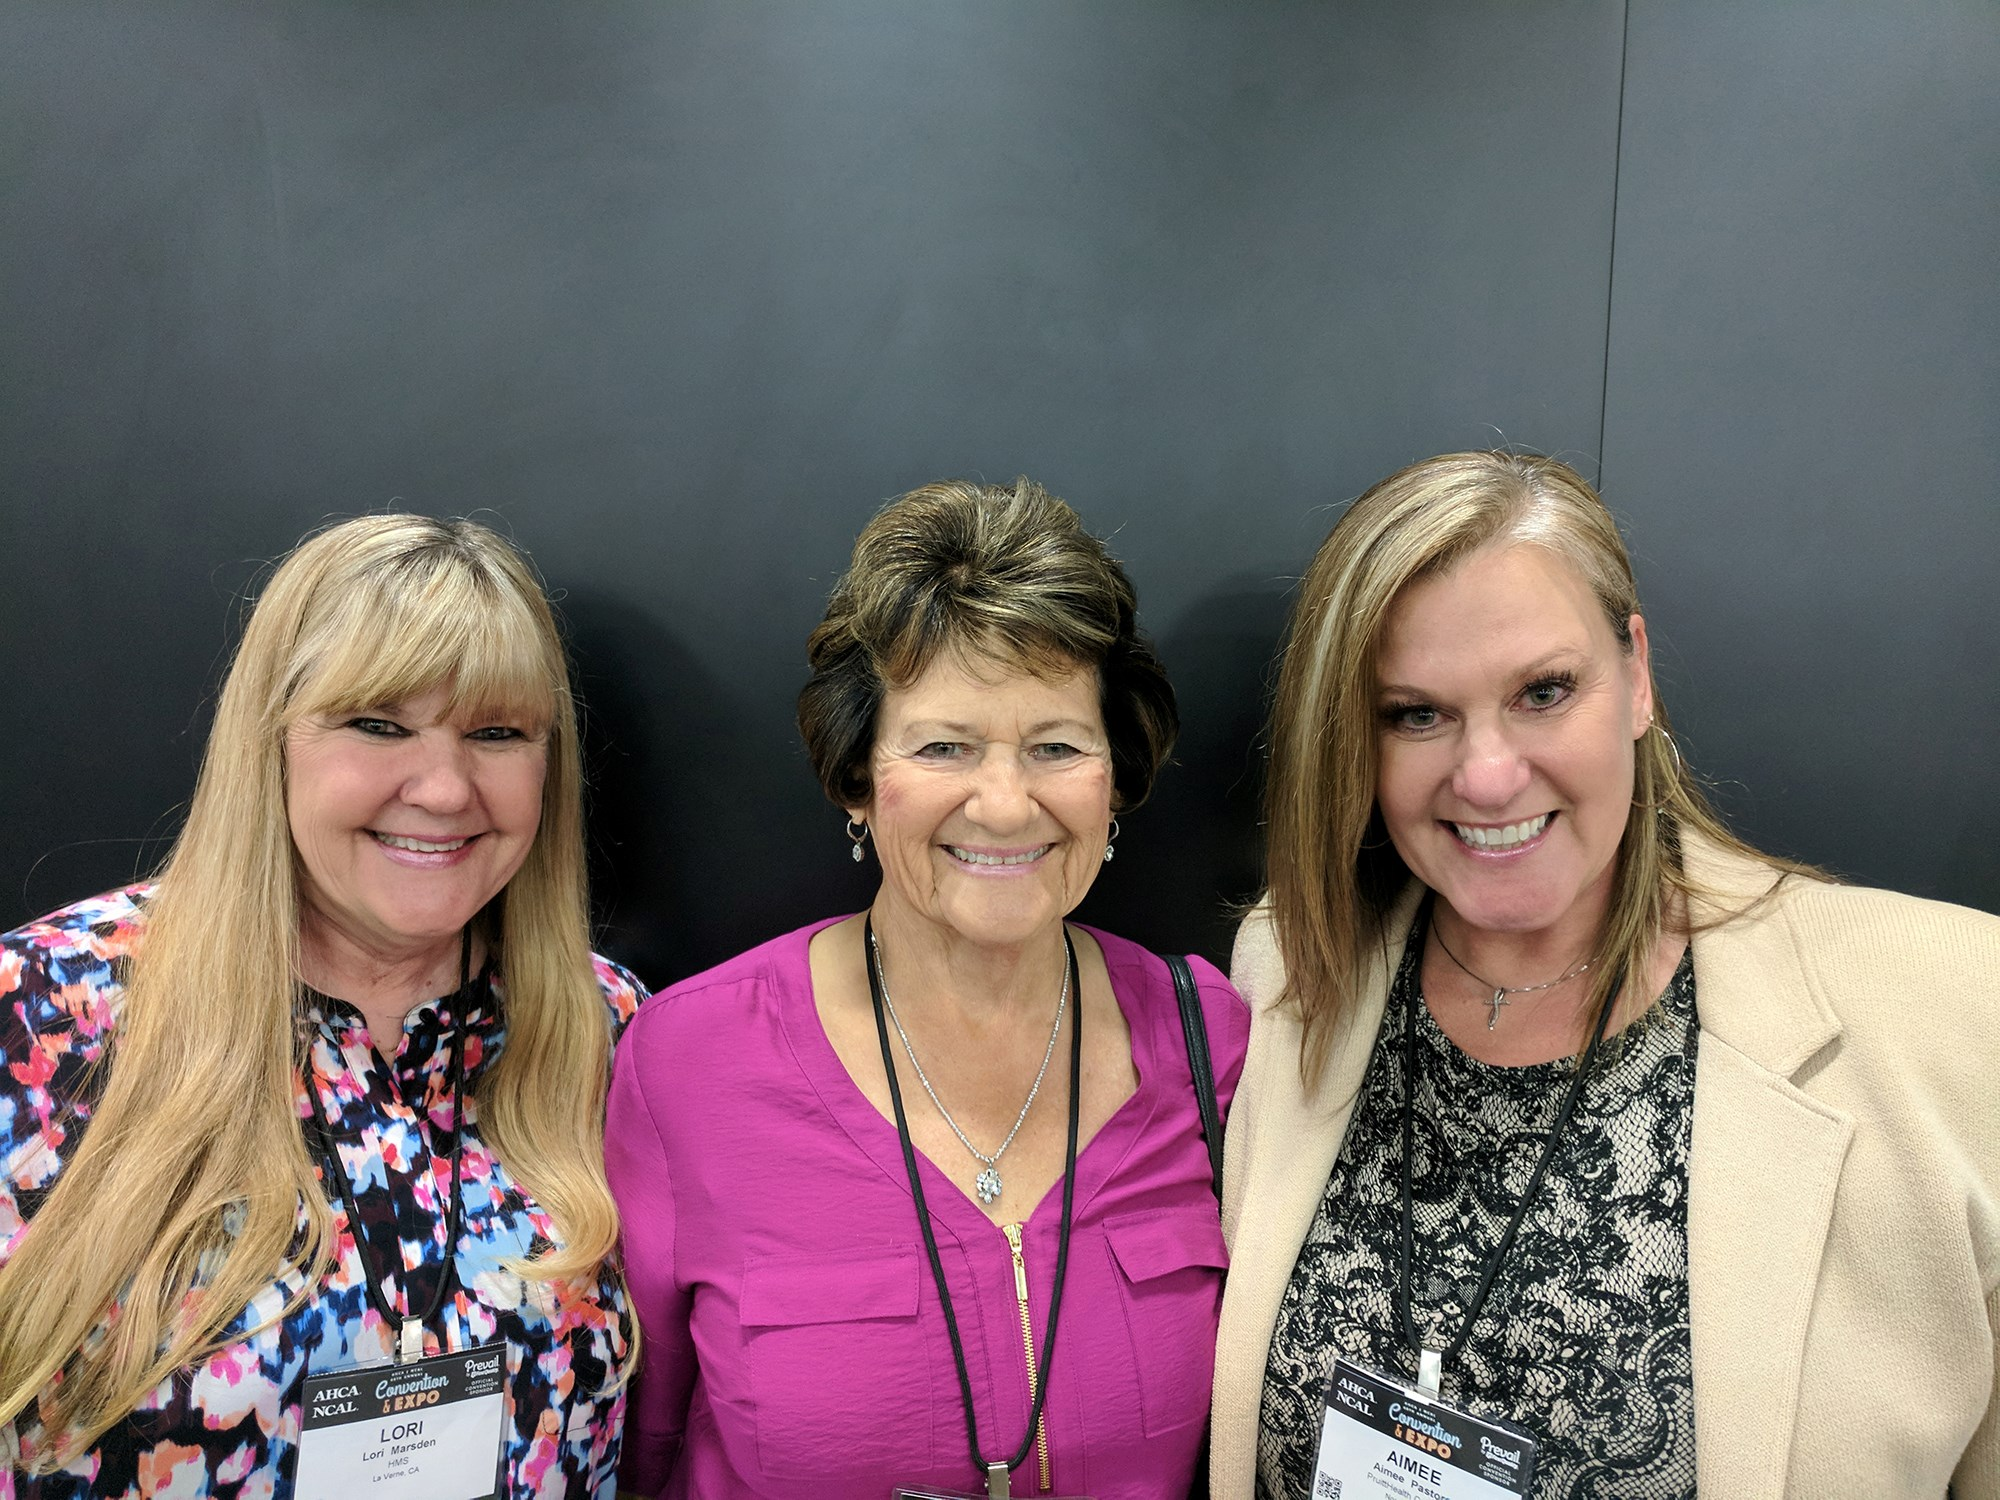 Lori Marsden, Merrilee Taylor and Aimee Pastore